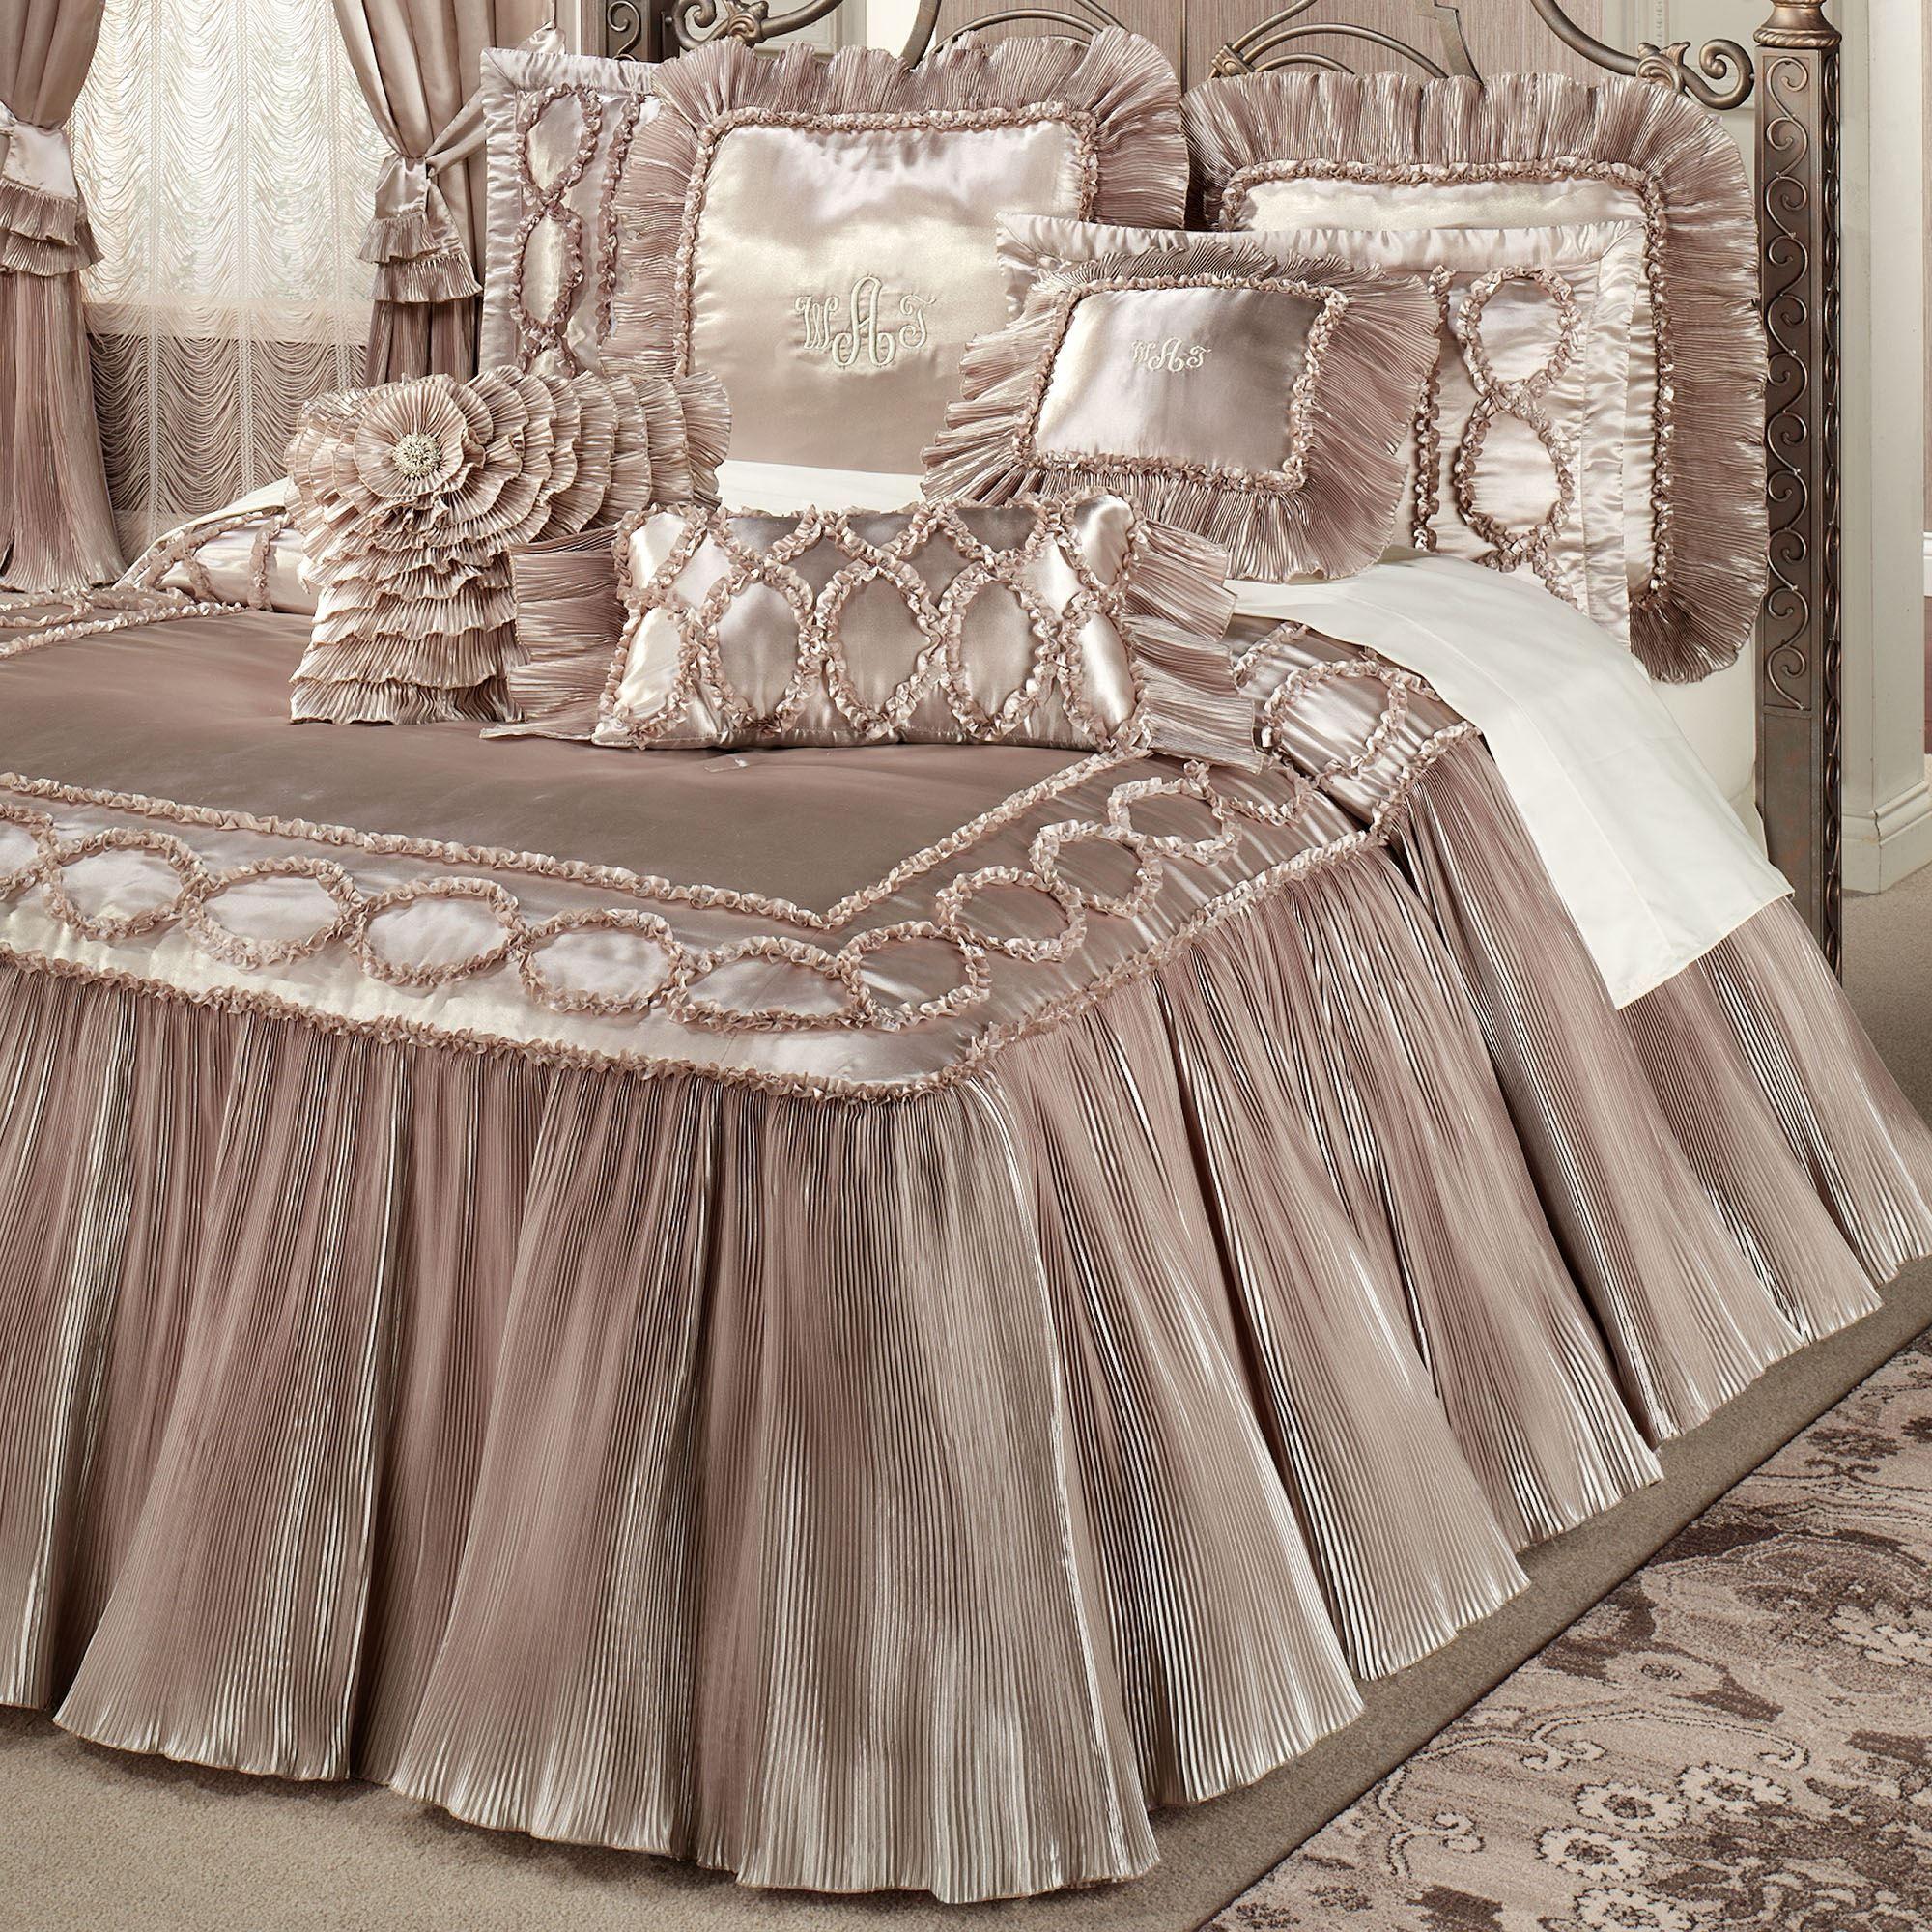 Ruffle Bedding Sets Size King